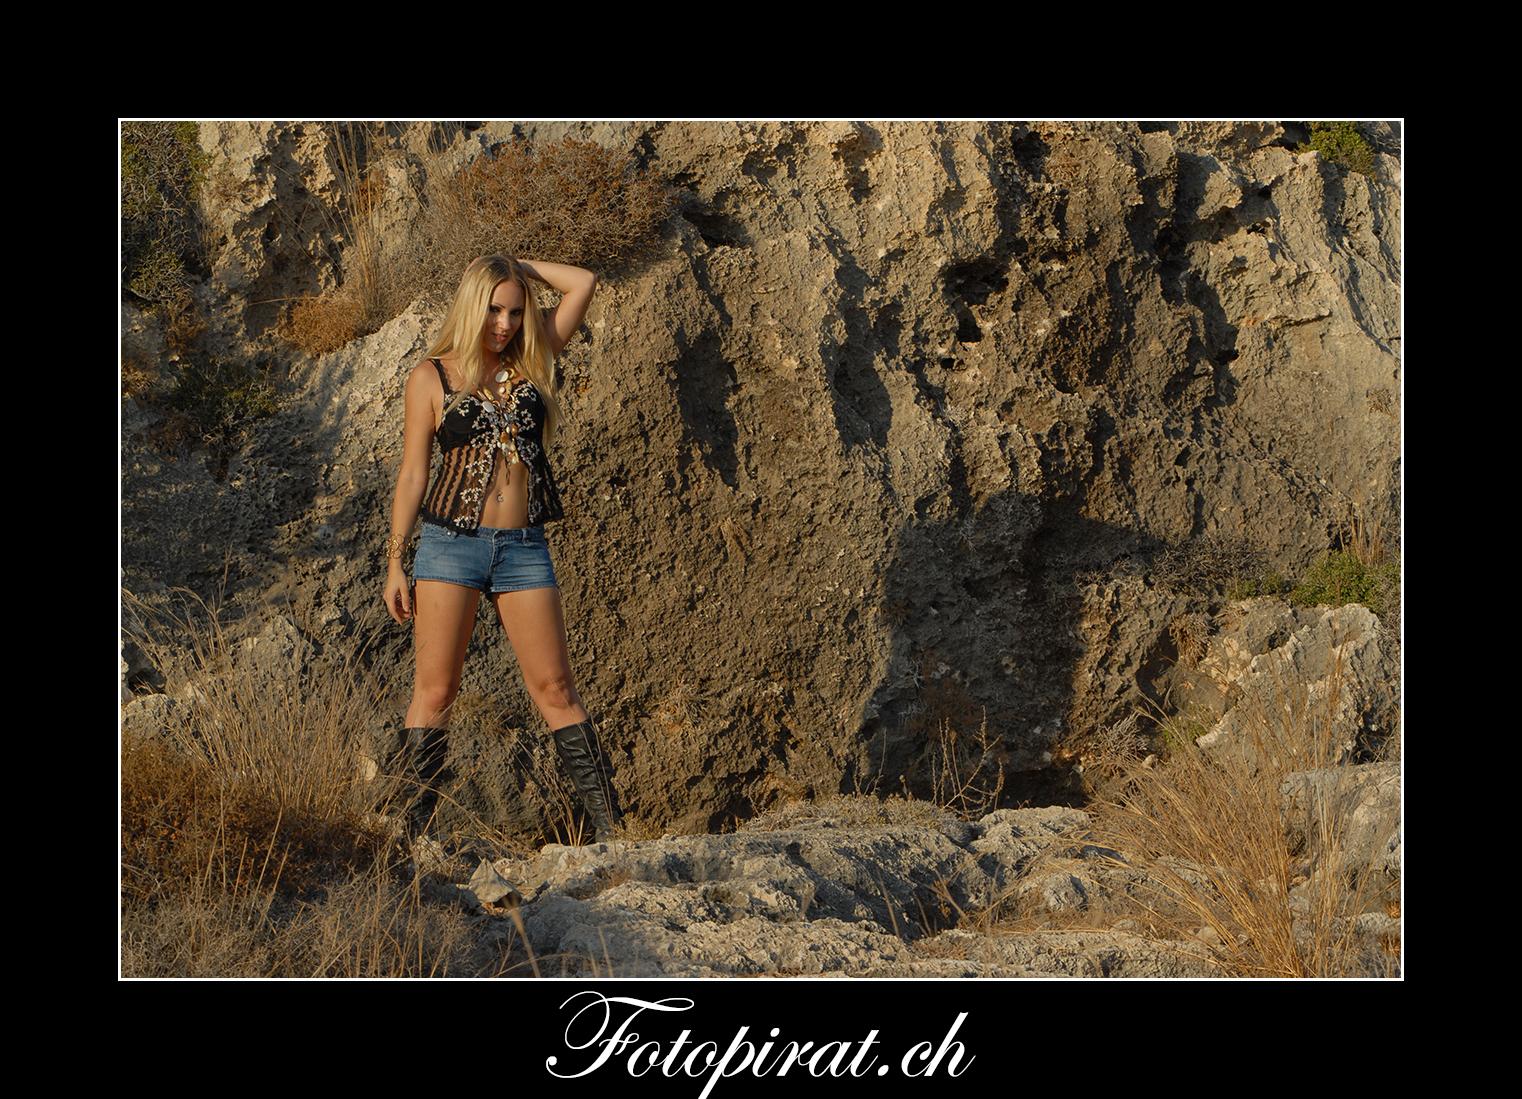 Fotoshooting, outdoor, Modelagentur, sexy Model, Fitnessmodel, blondes Fotomodel, Bachelor, Carmen Rüttimann